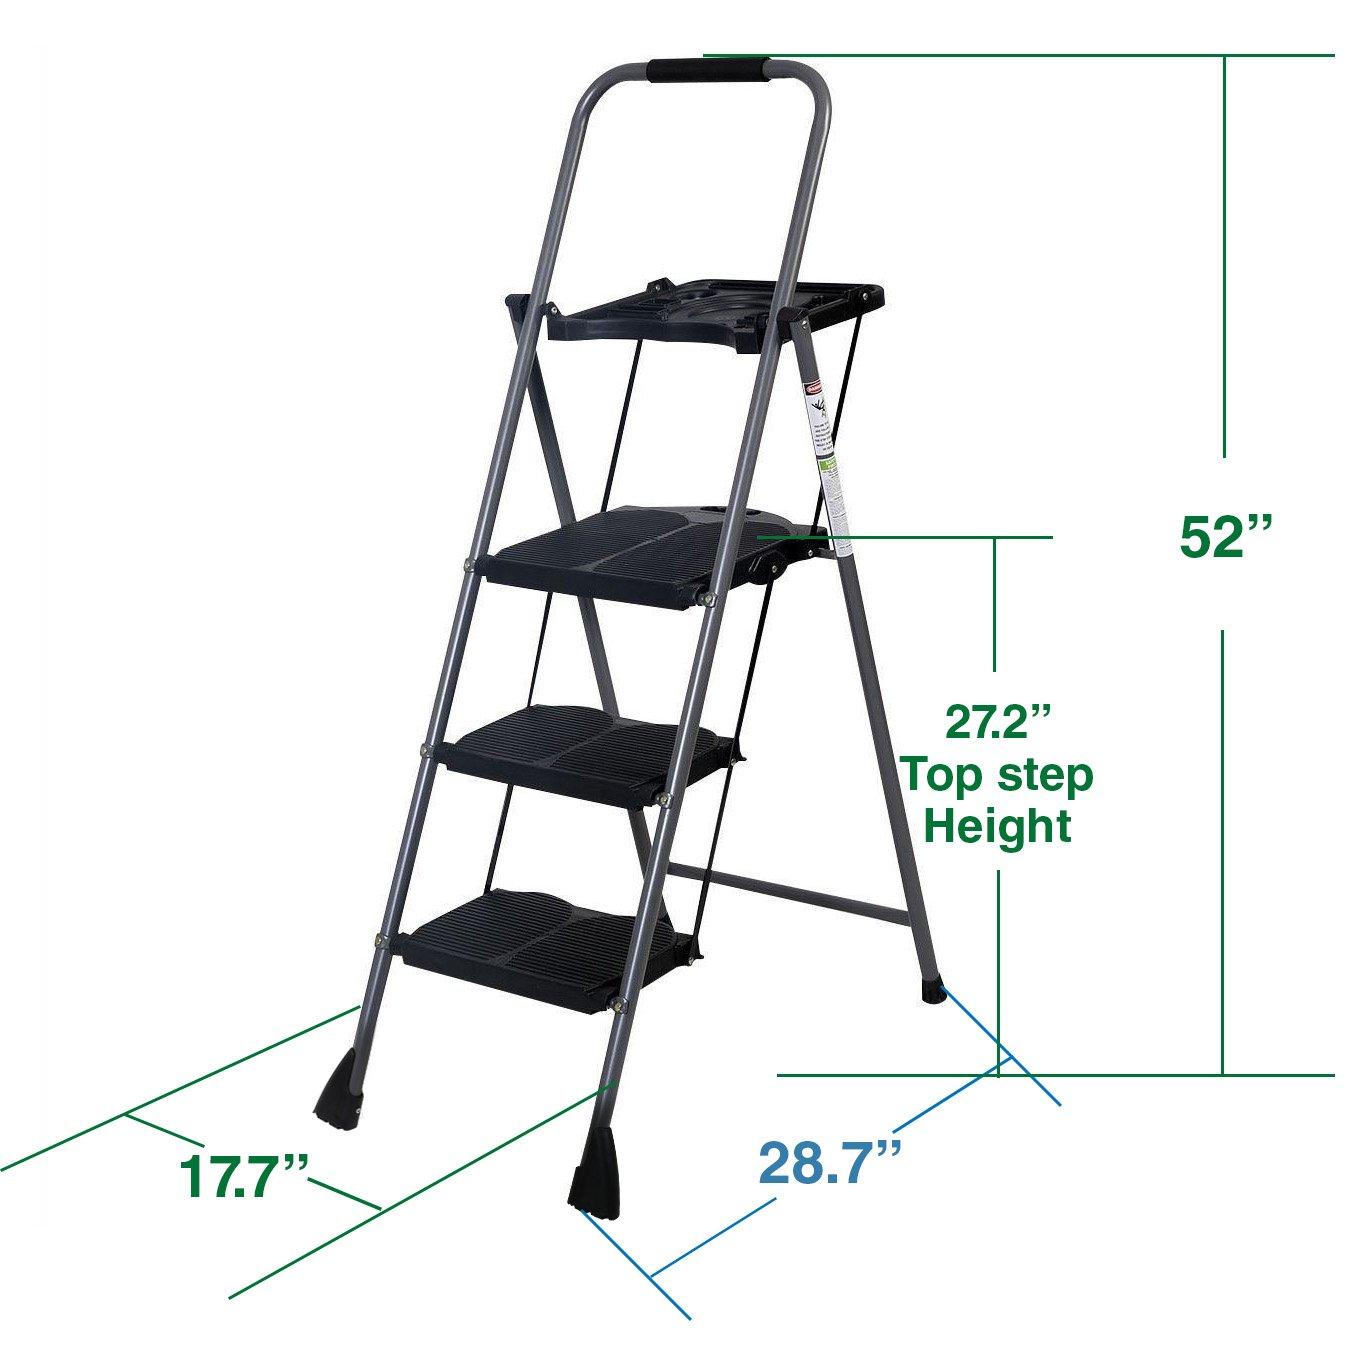 Get Quotations 3 Step W Work Tray 45FT Ladder Platform Lightweight Folding Stool 330 LB Cap